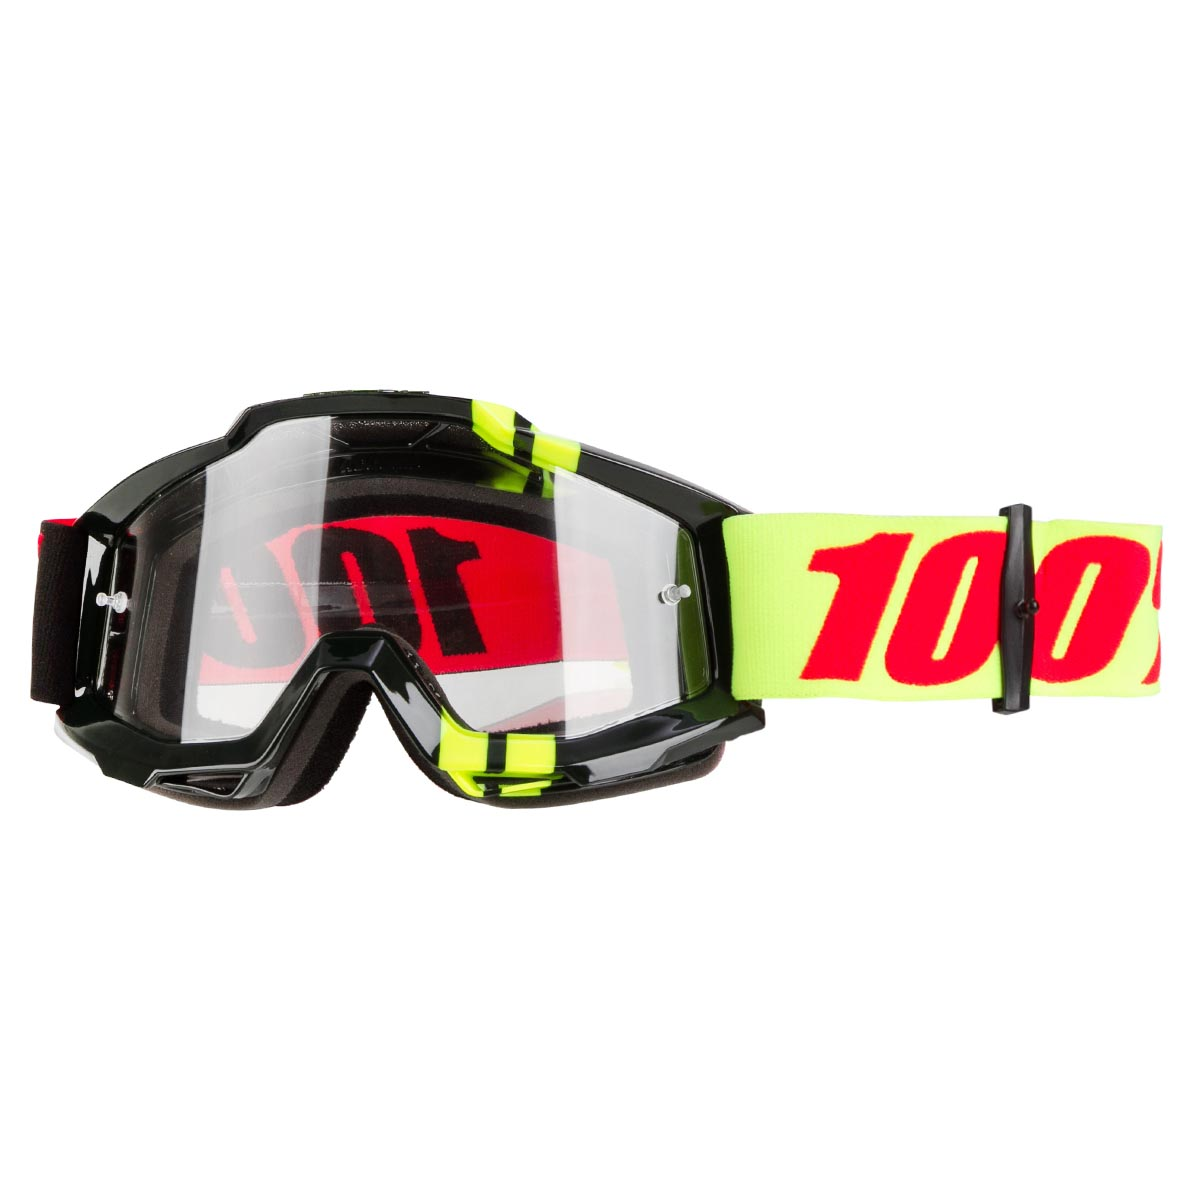 100% Goggle The Accuri Zerbo - Clear Anti-Fog